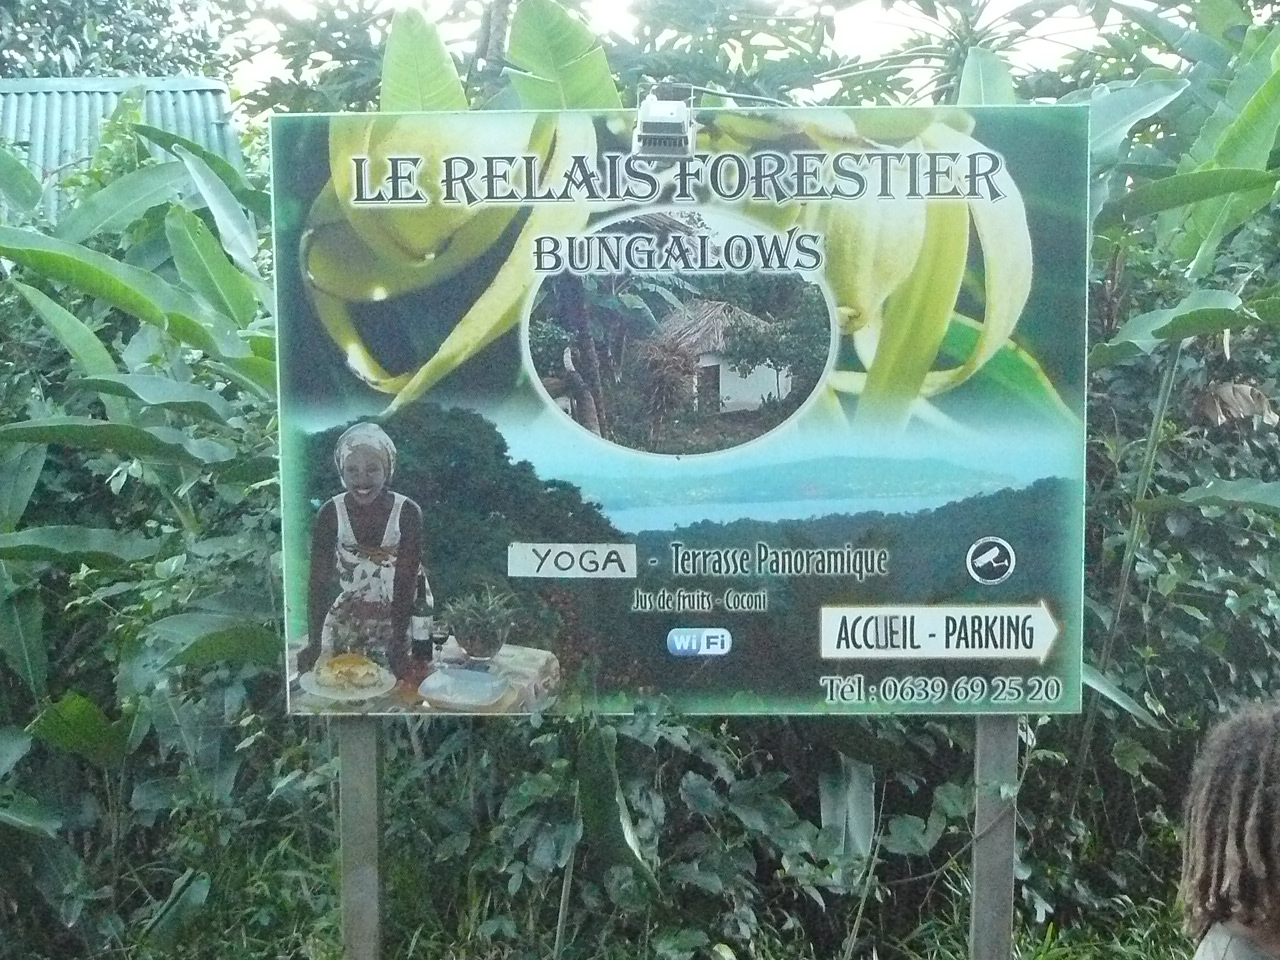 Mayotte_Combani_Relais Forestier_37